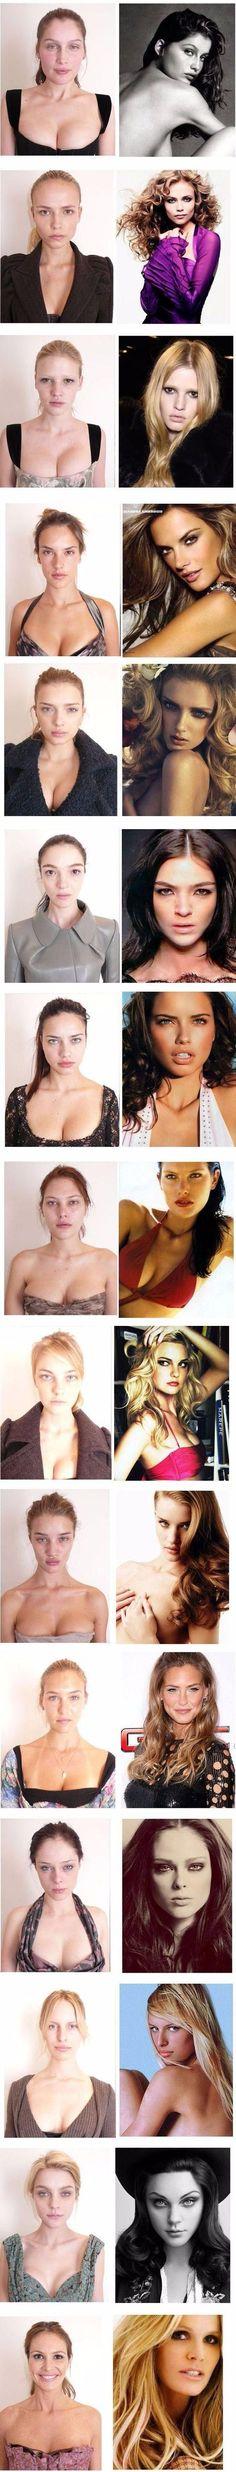 victoria's secret models,models before and after photoshop, models without makeup, models before and after makeup